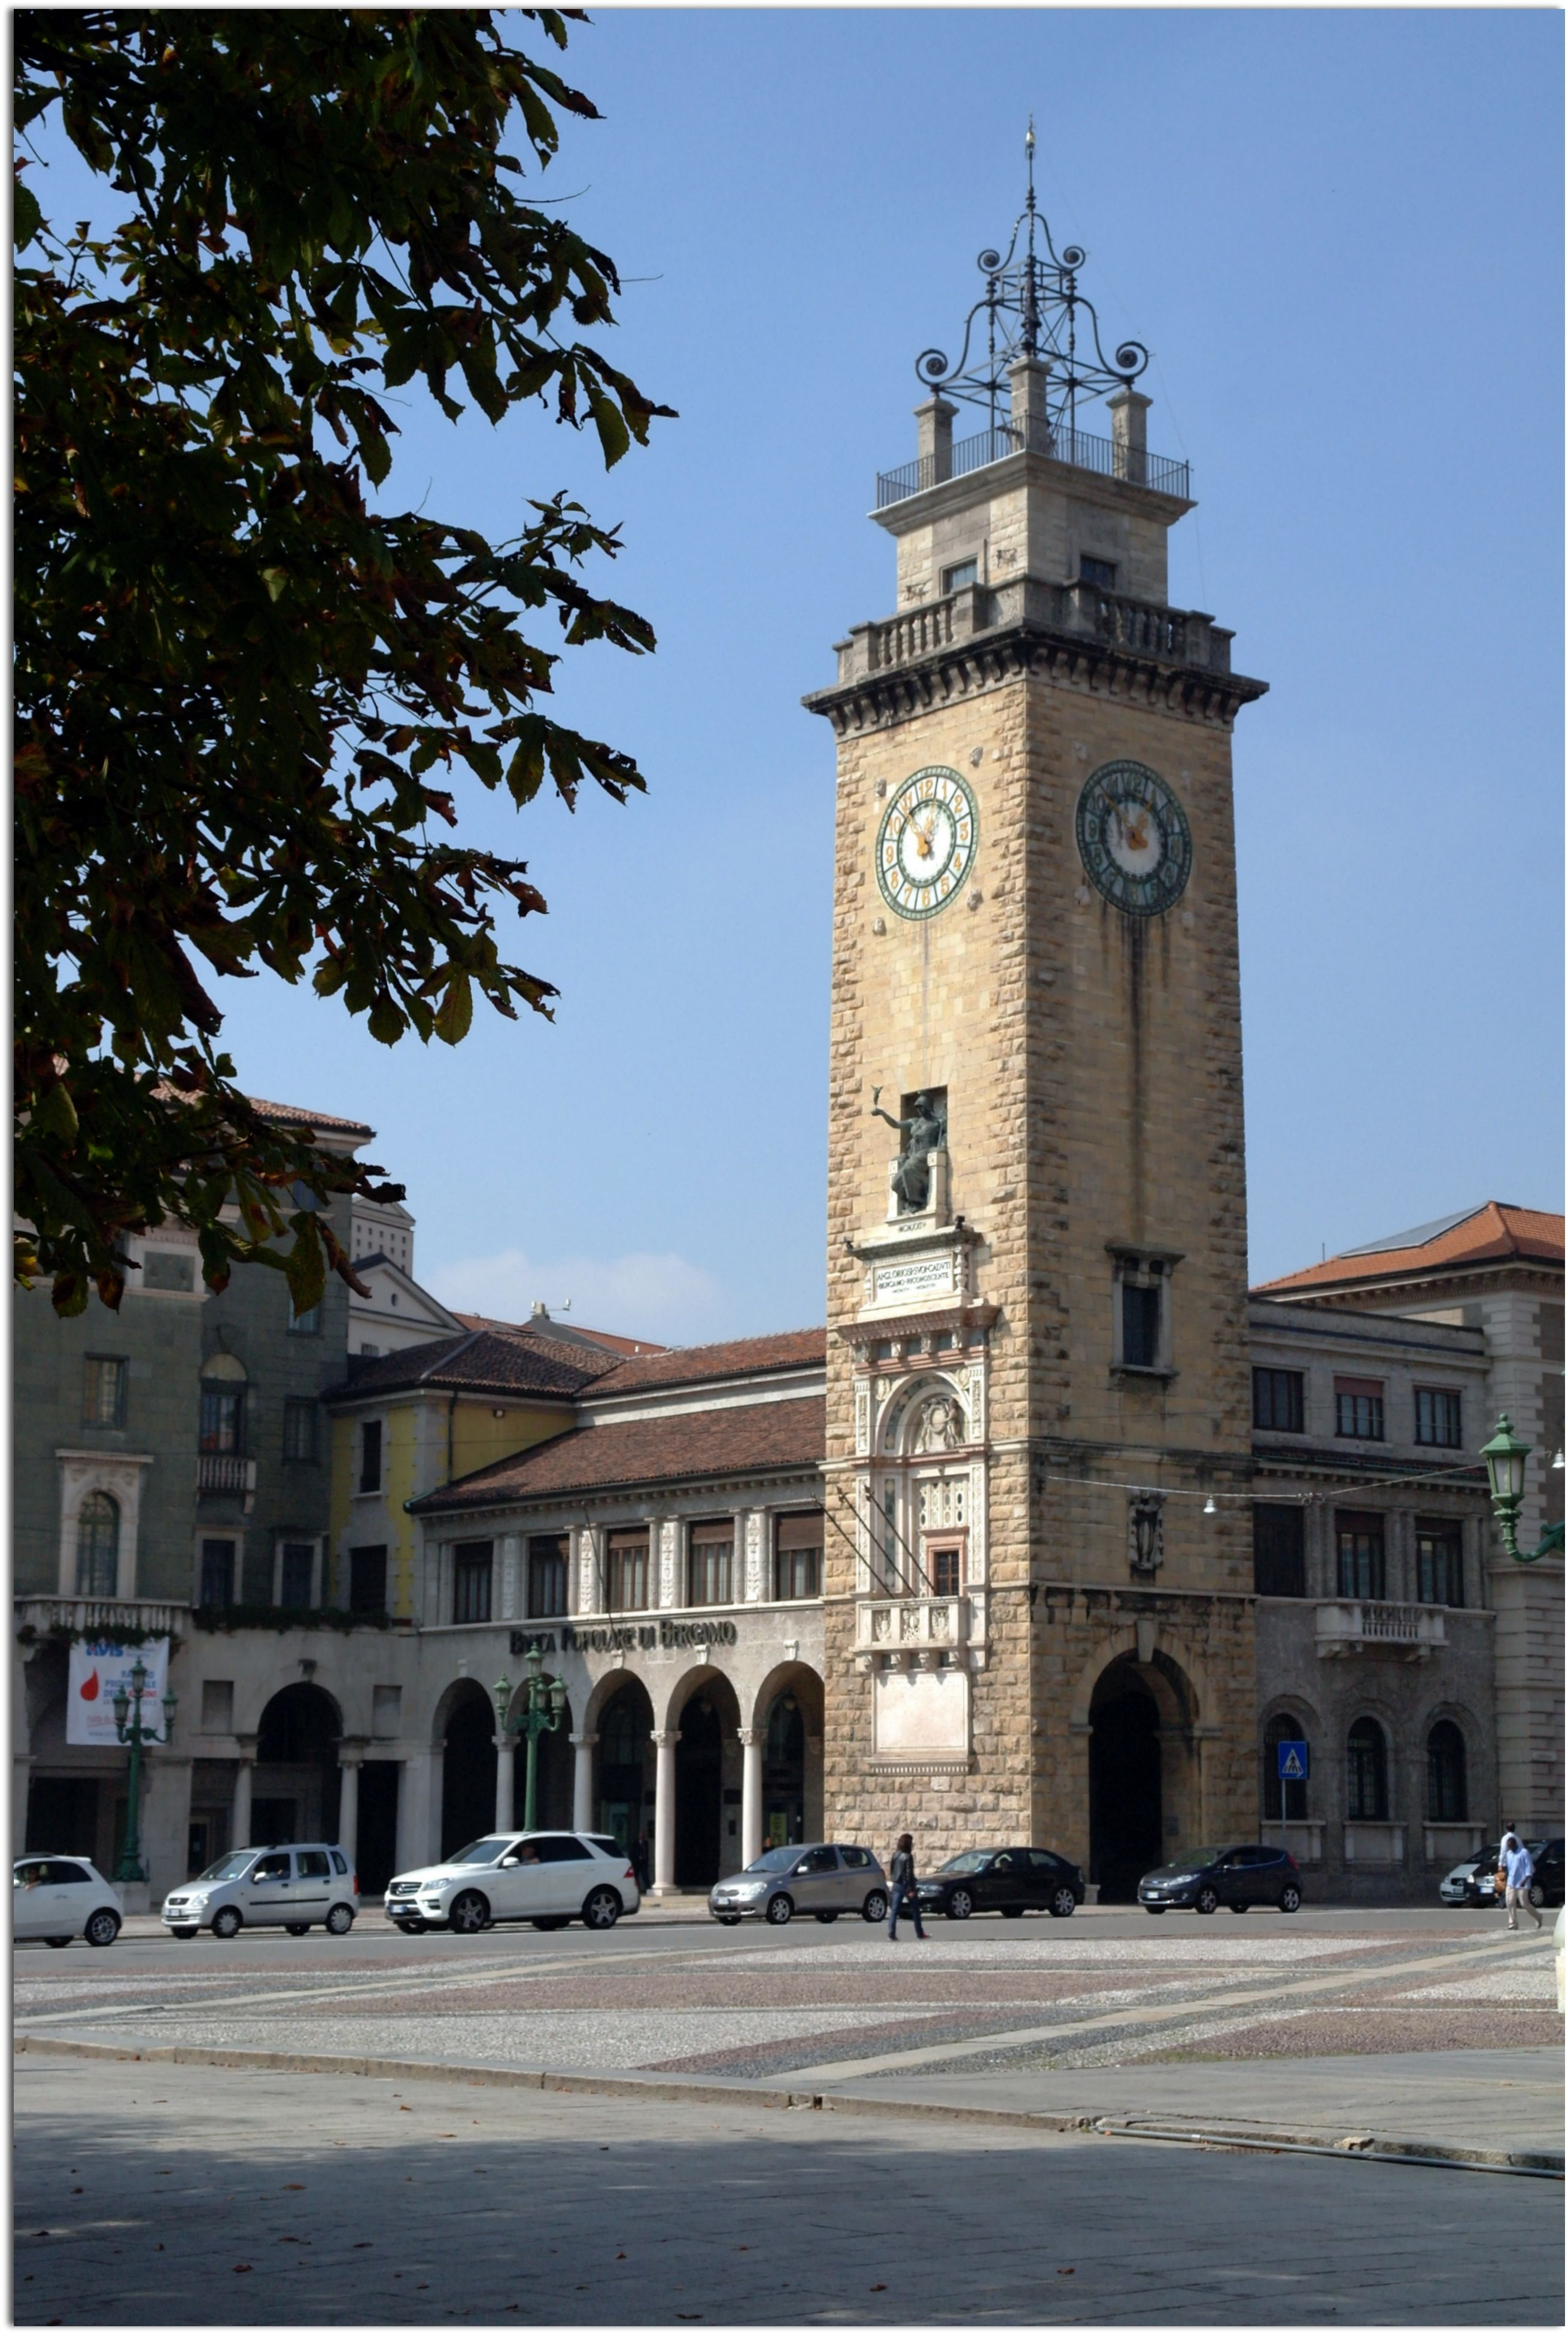 Memorial tower in porta nuova bergamo italy torre for Galleria carrara bergamo